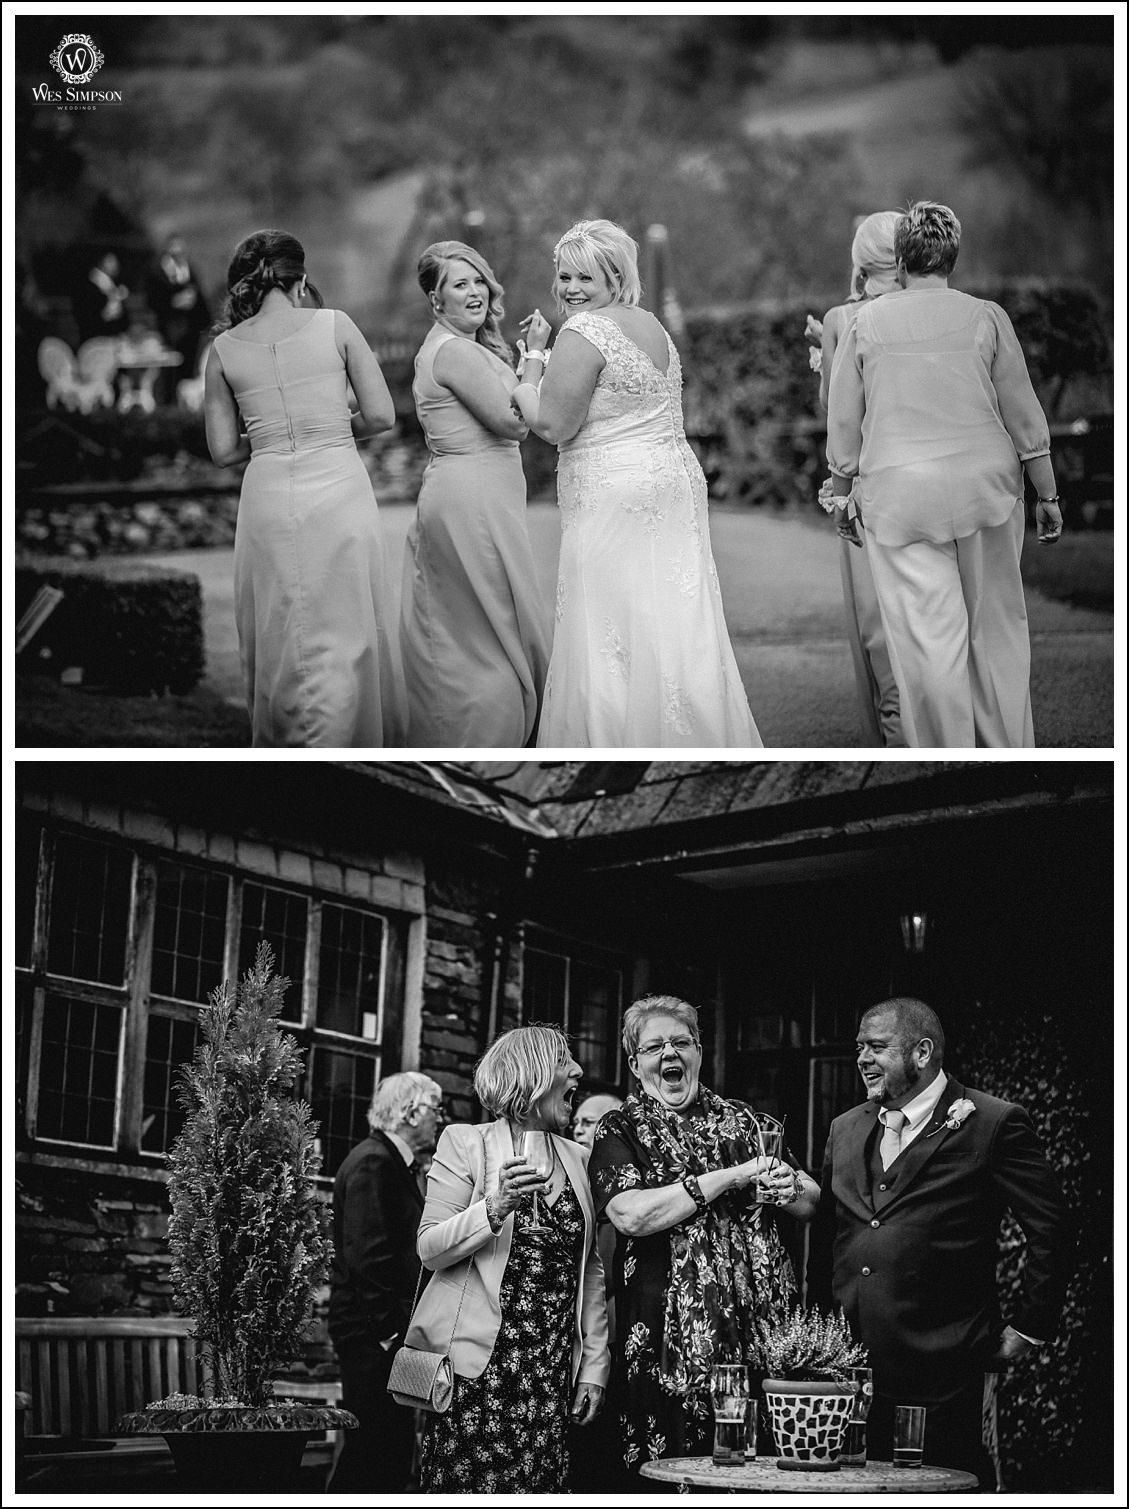 Broadoaks wedding venue, Lake District wedding photographer, Windermere, Wes Simpson photography_0052